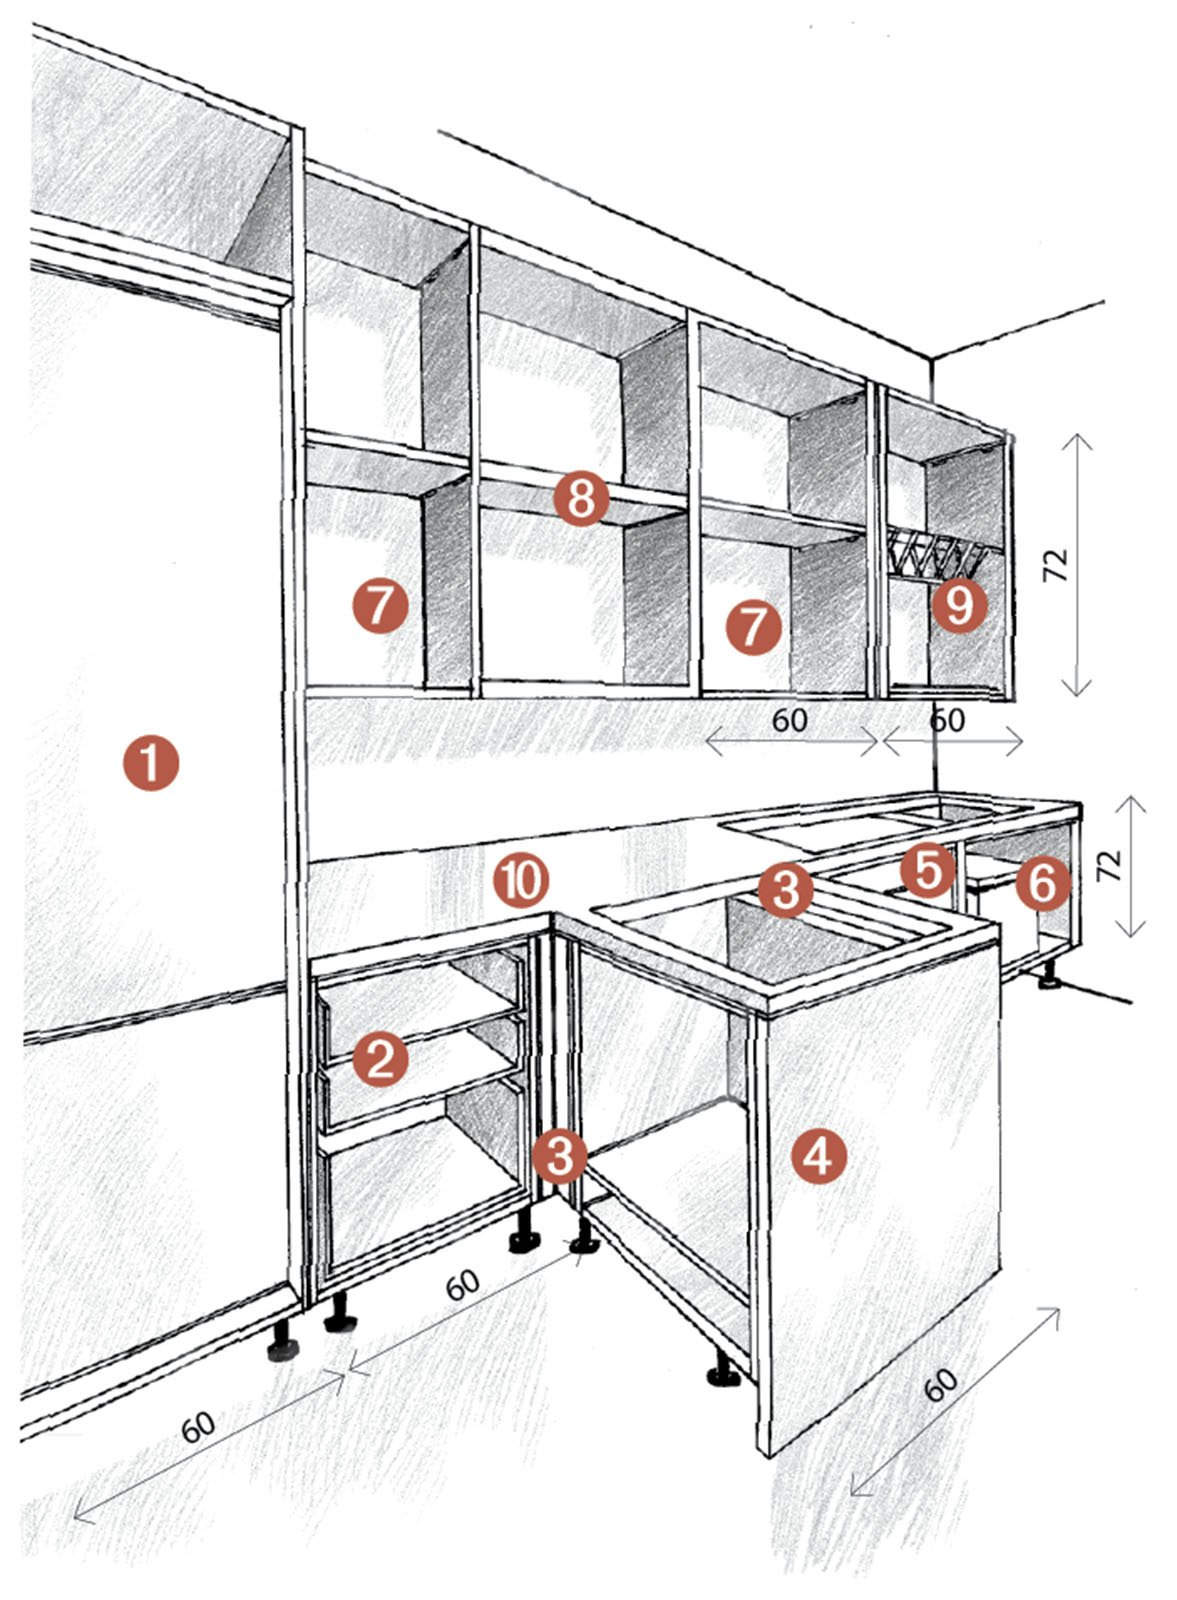 Cucina Concentrata In 3 Metri Cose Di Casa #994432 1177 1600 Come Arredare Cucina A Vista